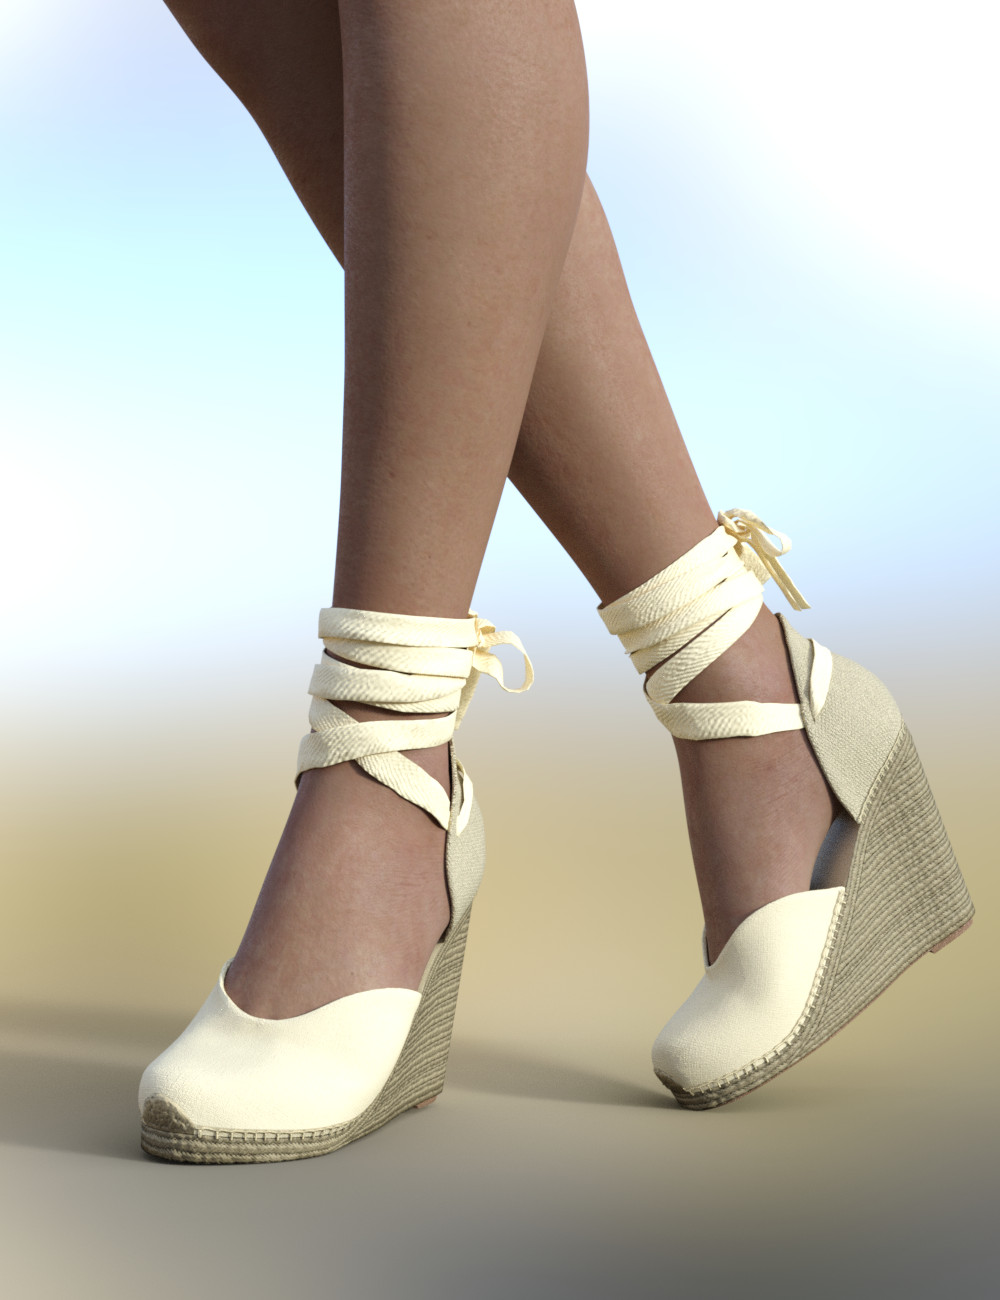 Espadrilles for Genesis 8 Female(s) by: Maralyn, 3D Models by Daz 3D